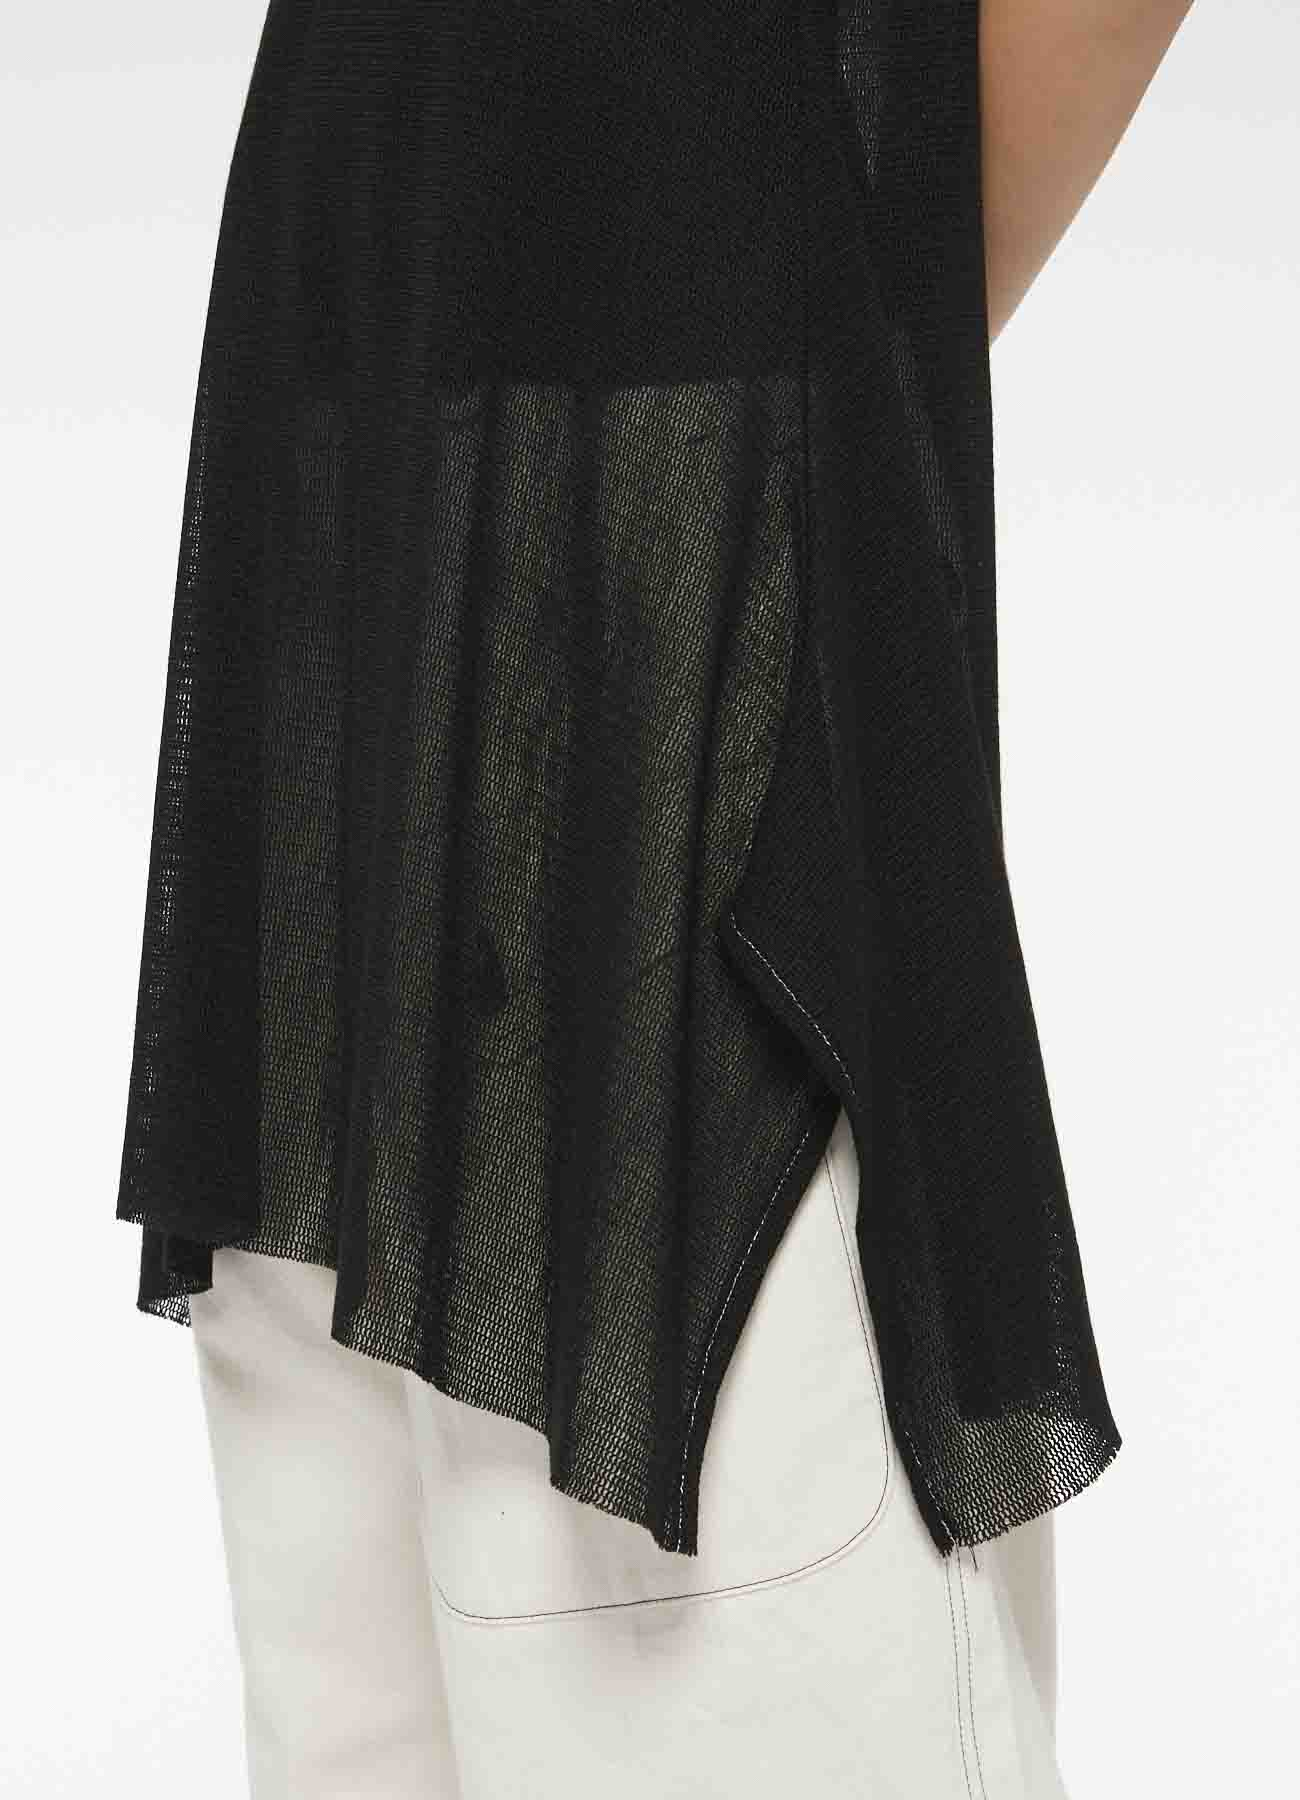 ACRYL WOOL TULLE BOTTOM DRAPE DRESS